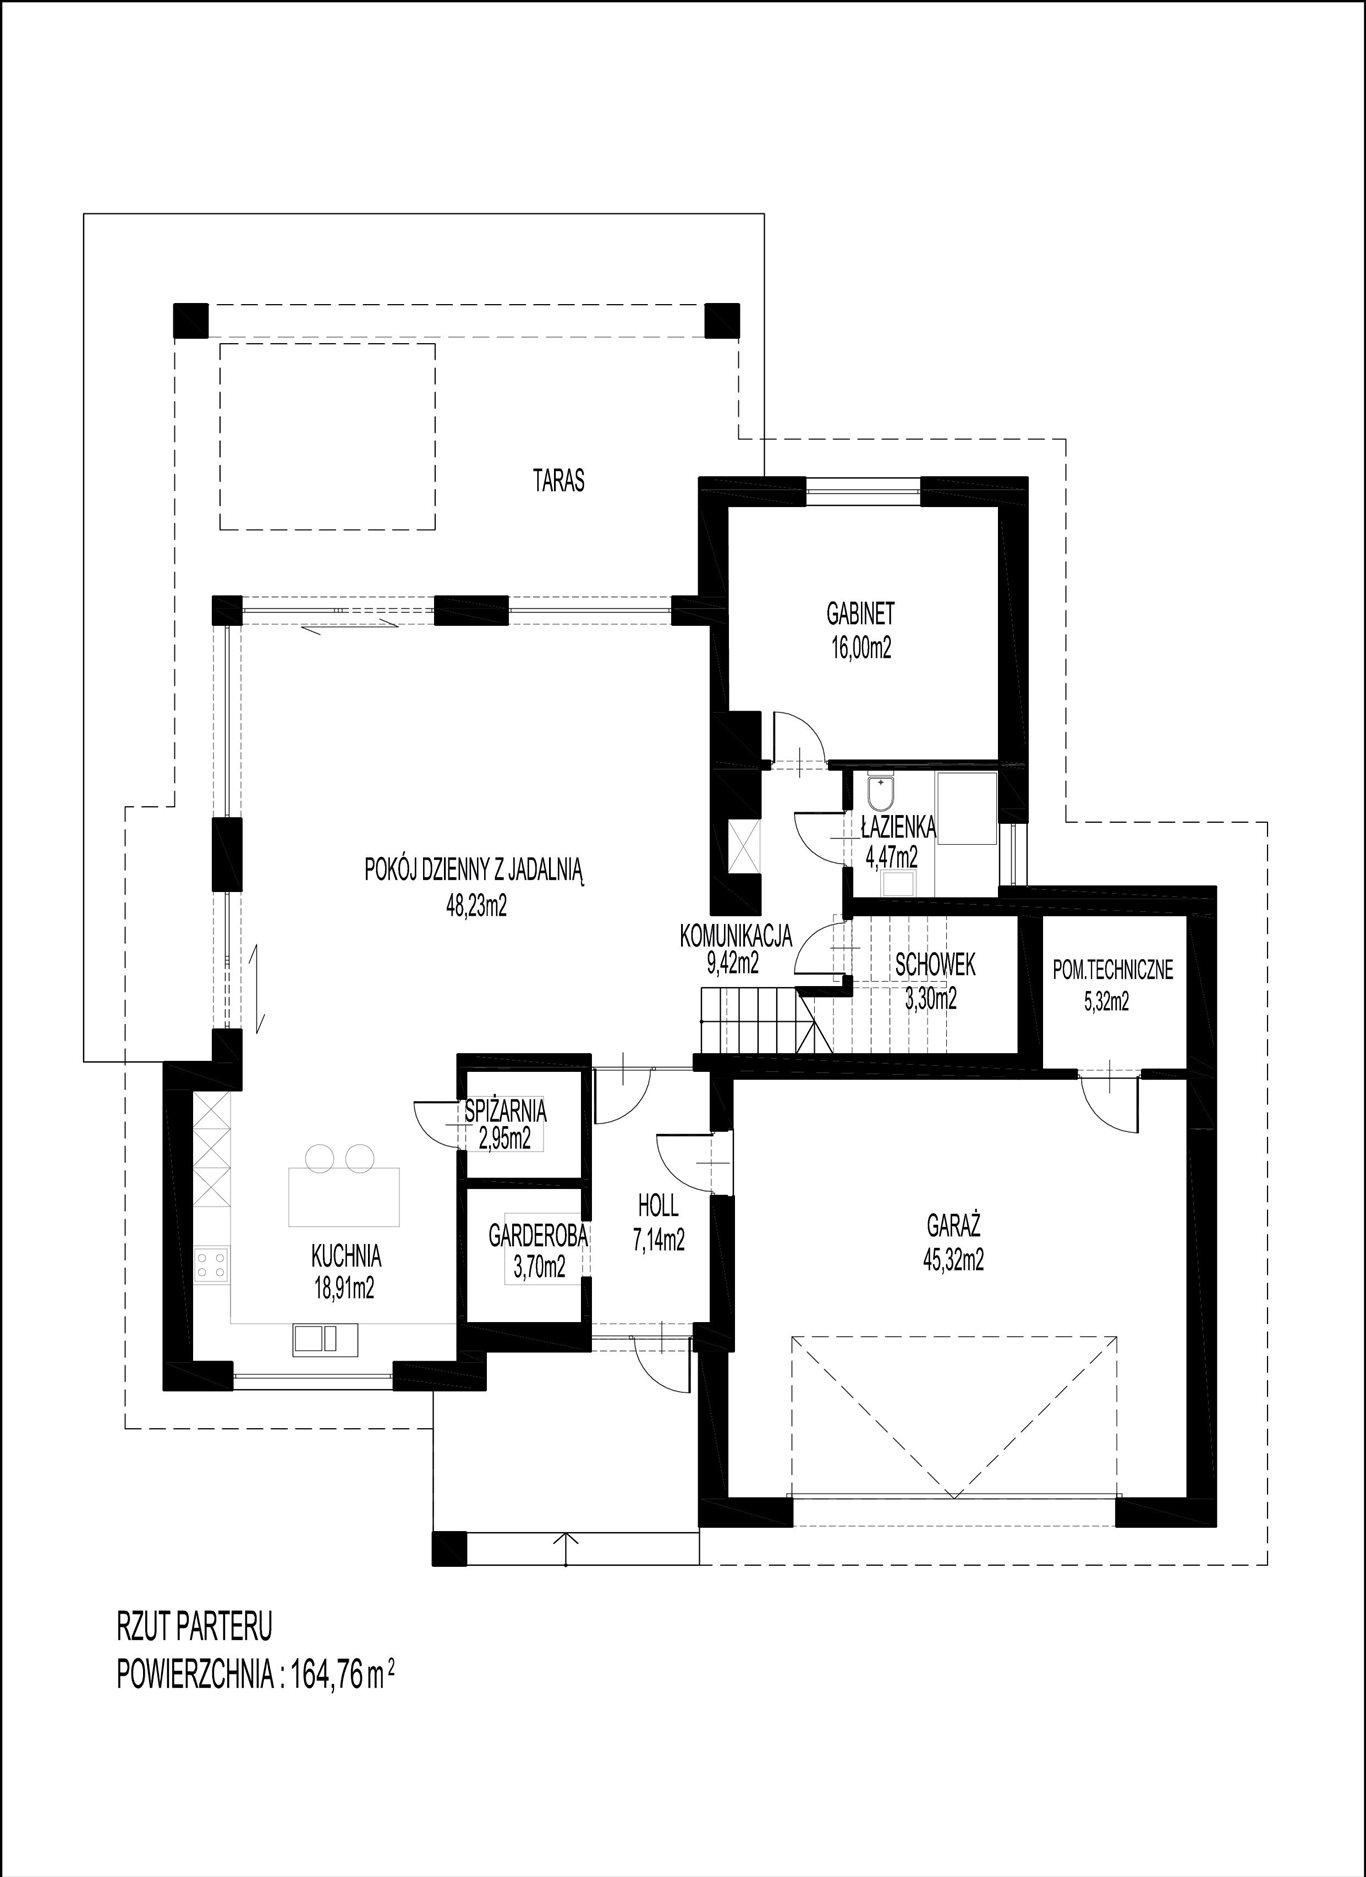 Dom na sprzedaż Konstancin-Jeziorna, Traugutt, Traugutta  304m2 Foto 4